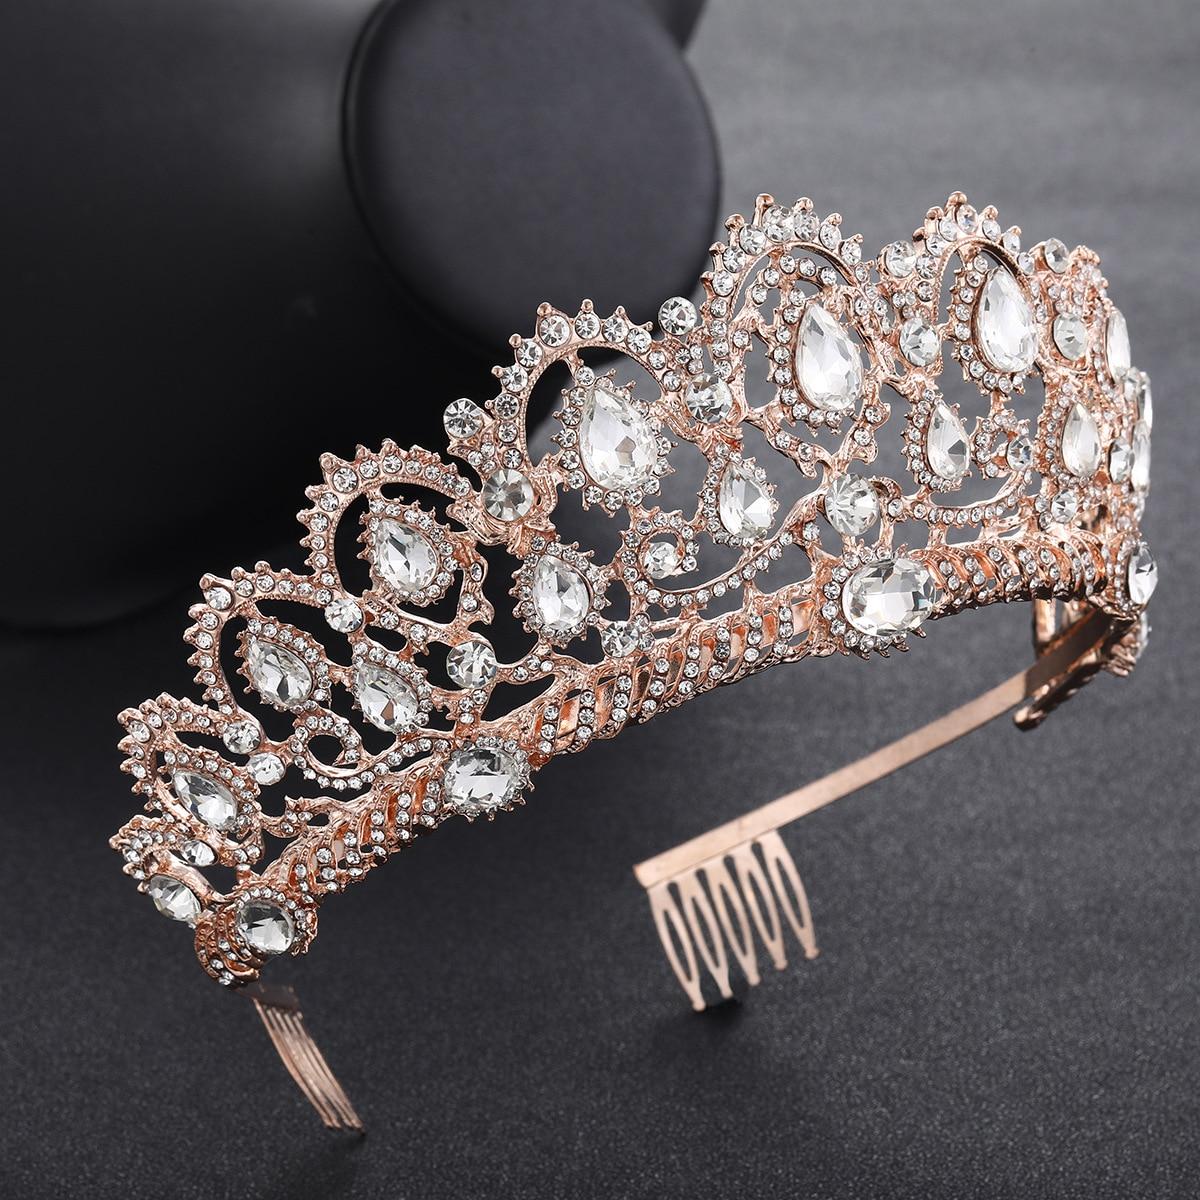 Vintage Wedding Bride Queen Colours crystal Golden Crown Tiara Hair Accessories